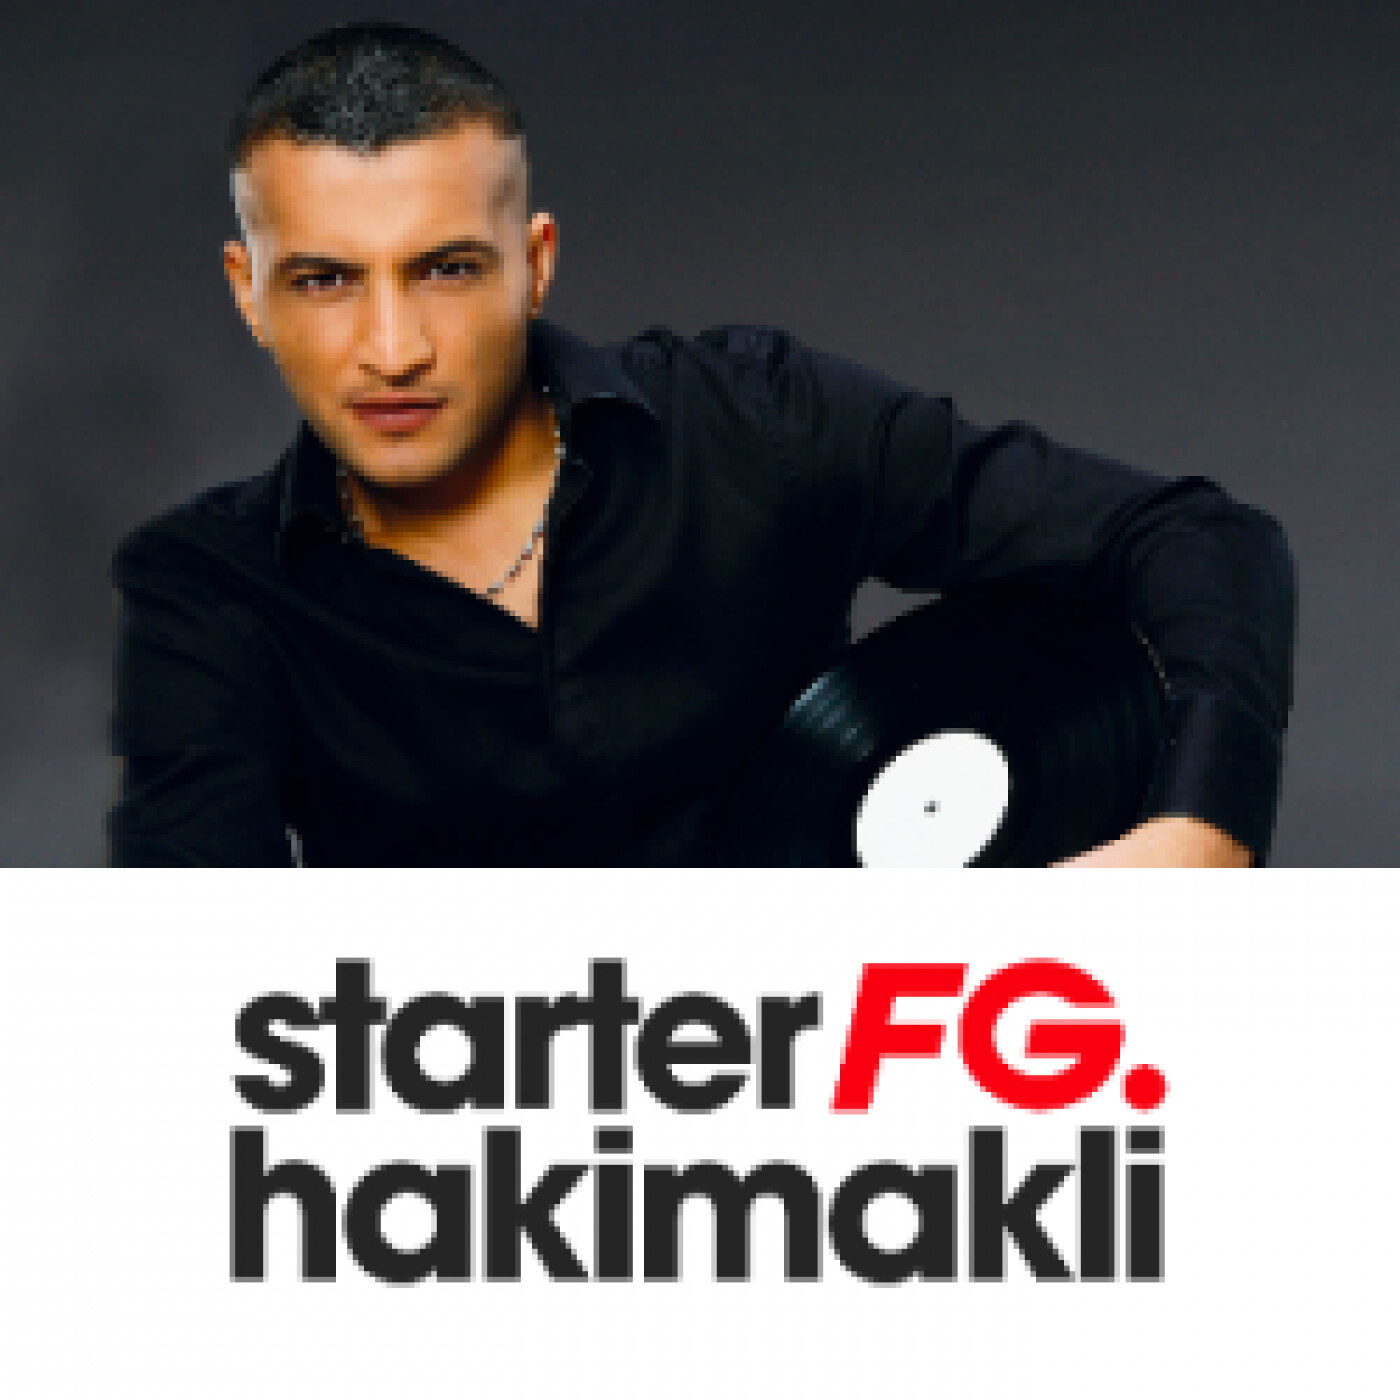 STARTER FG BY HAKIMAKLI VENDREDI 11 JUIN 2021